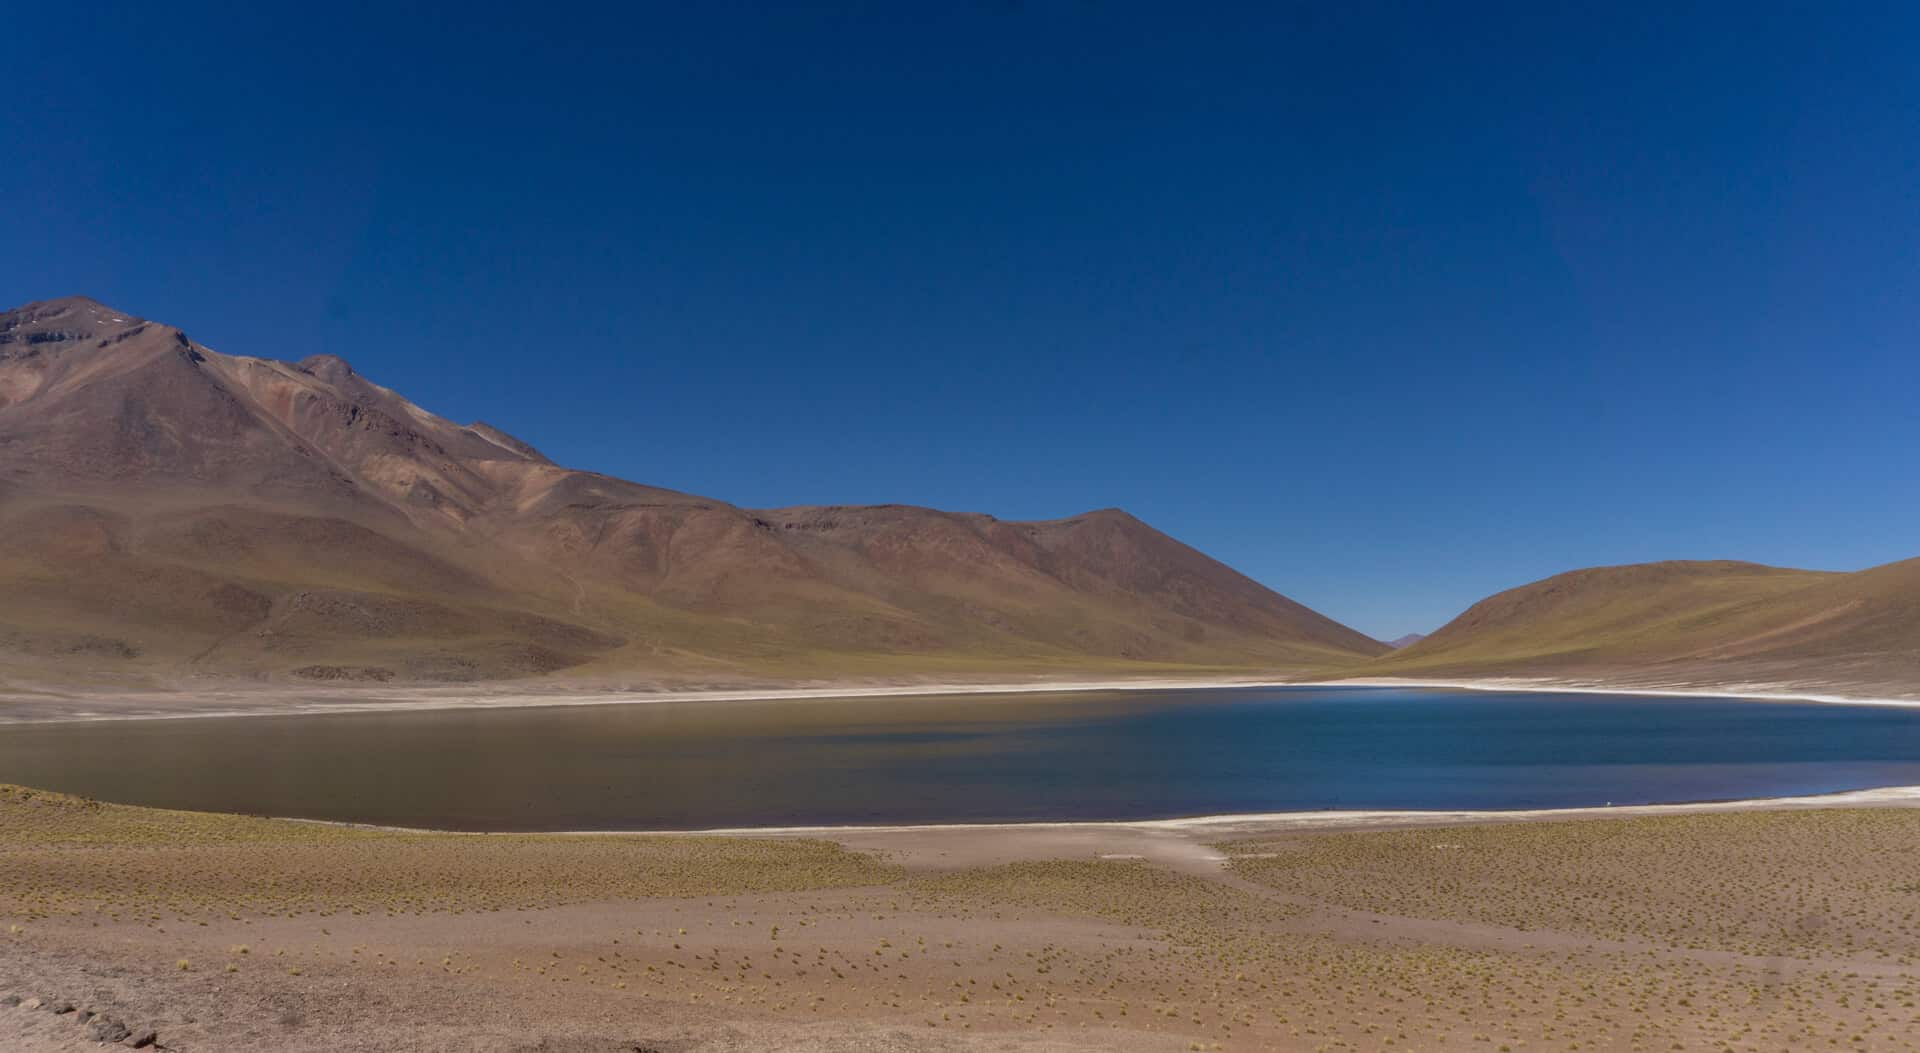 High lagoons in the Atacama Desert